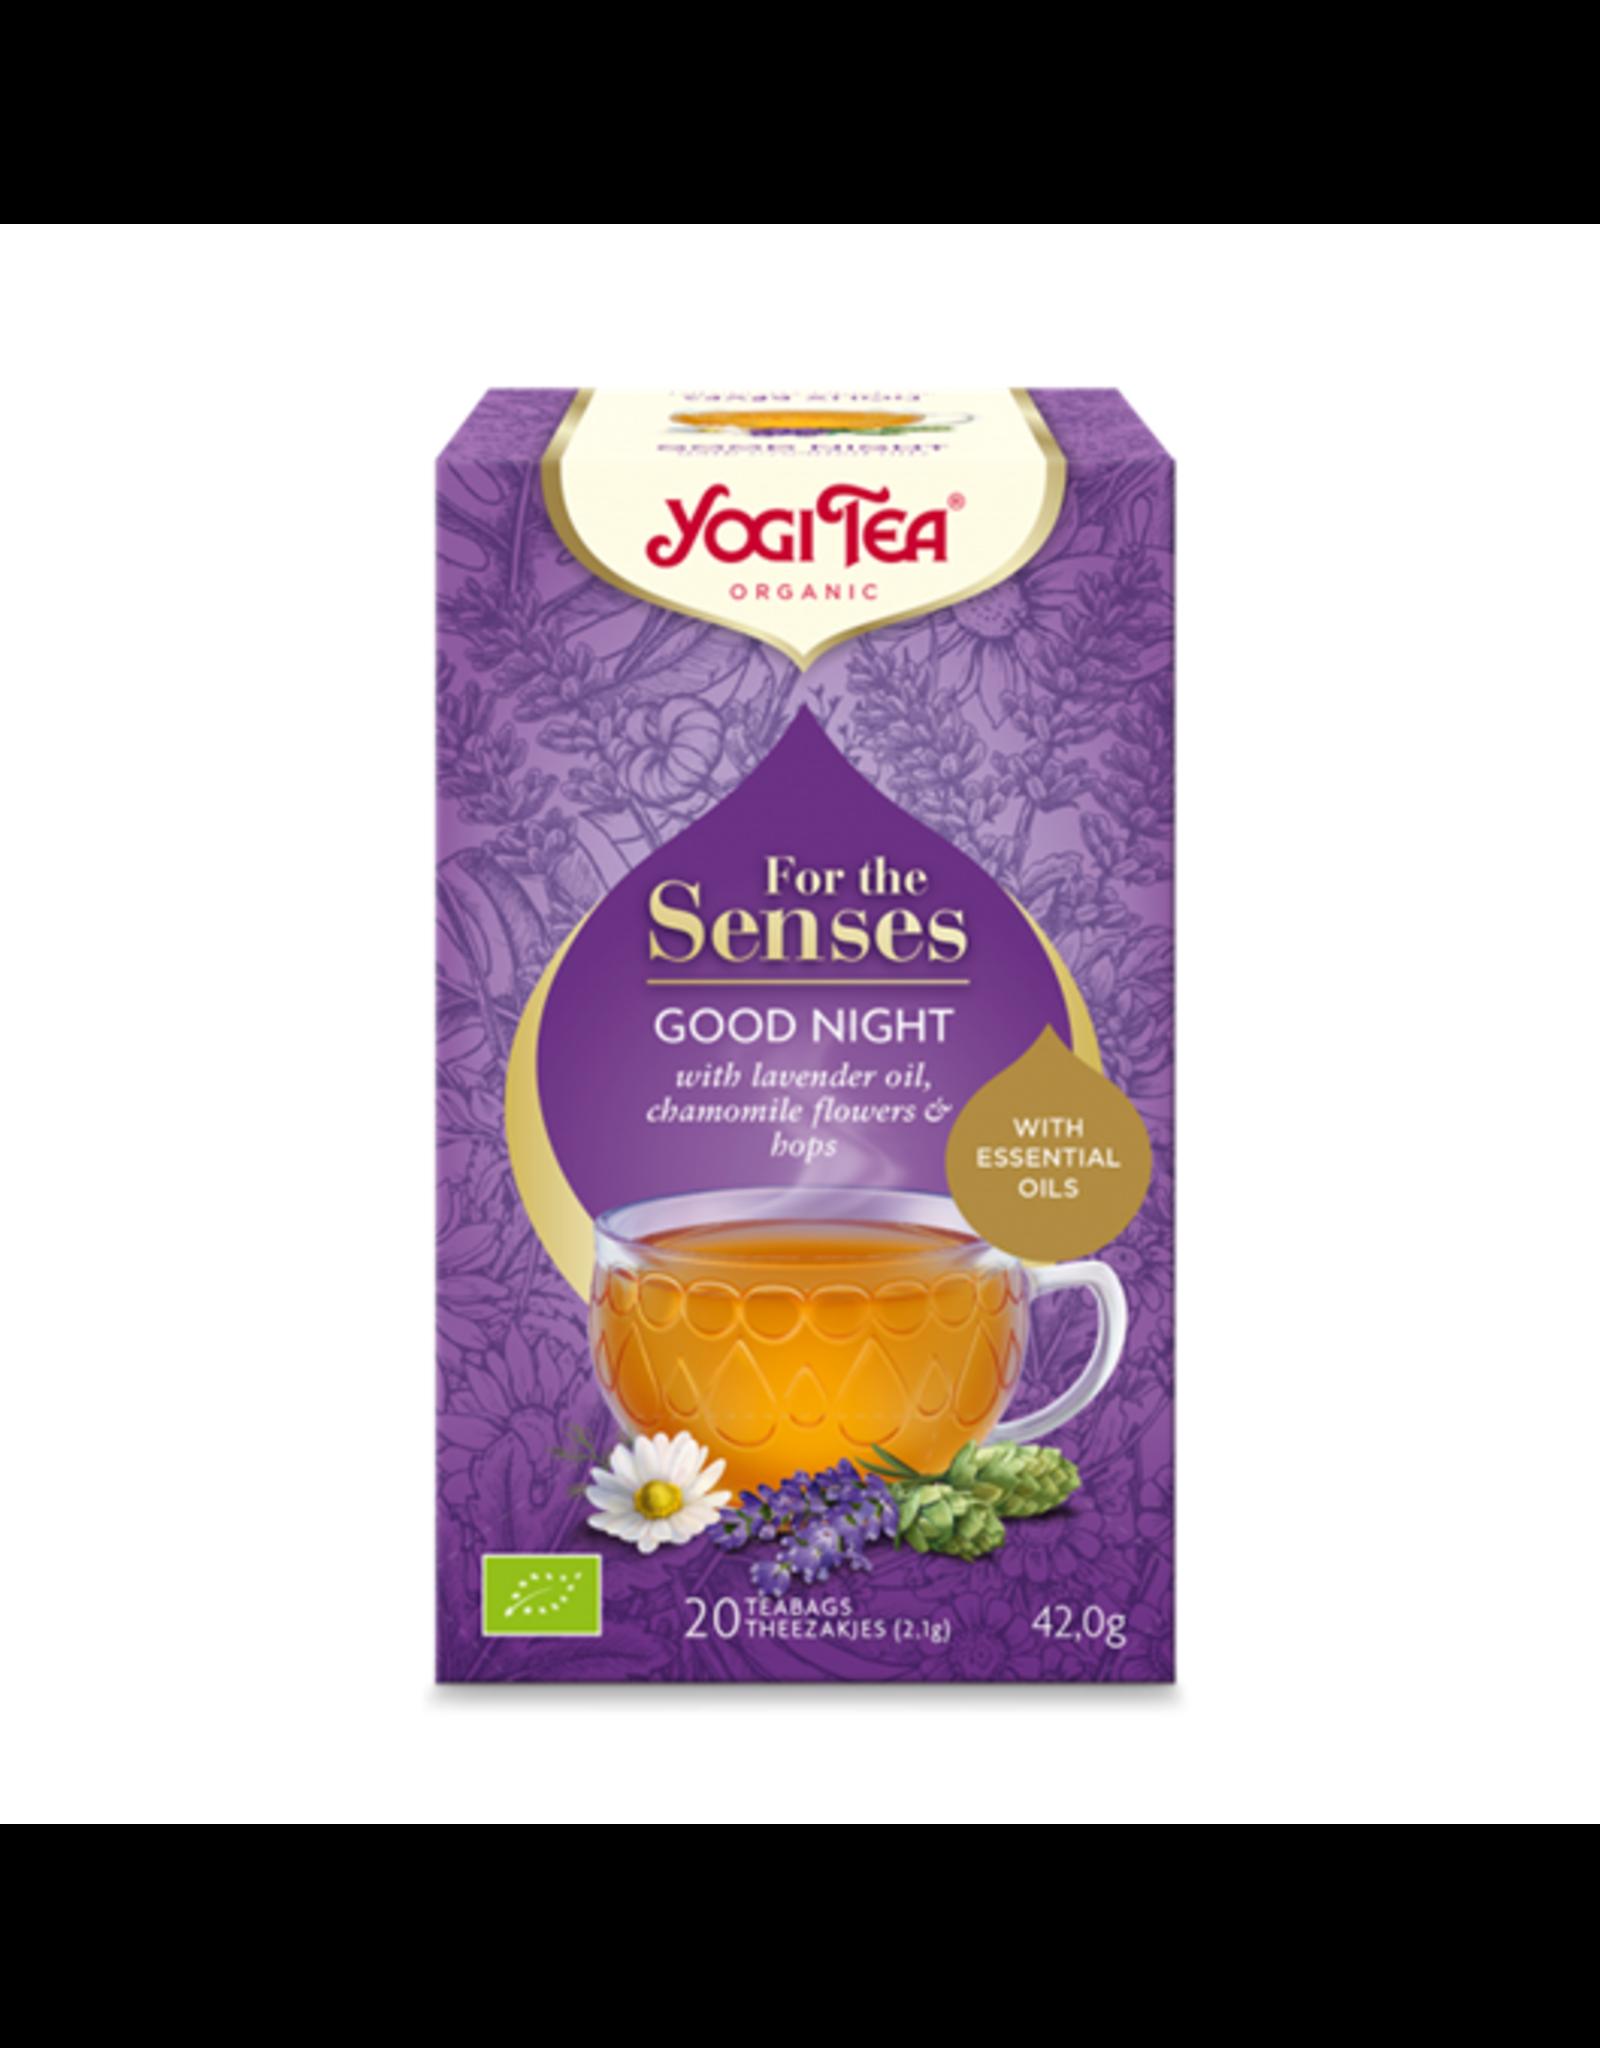 Yogi Tea For the Senses Good Night